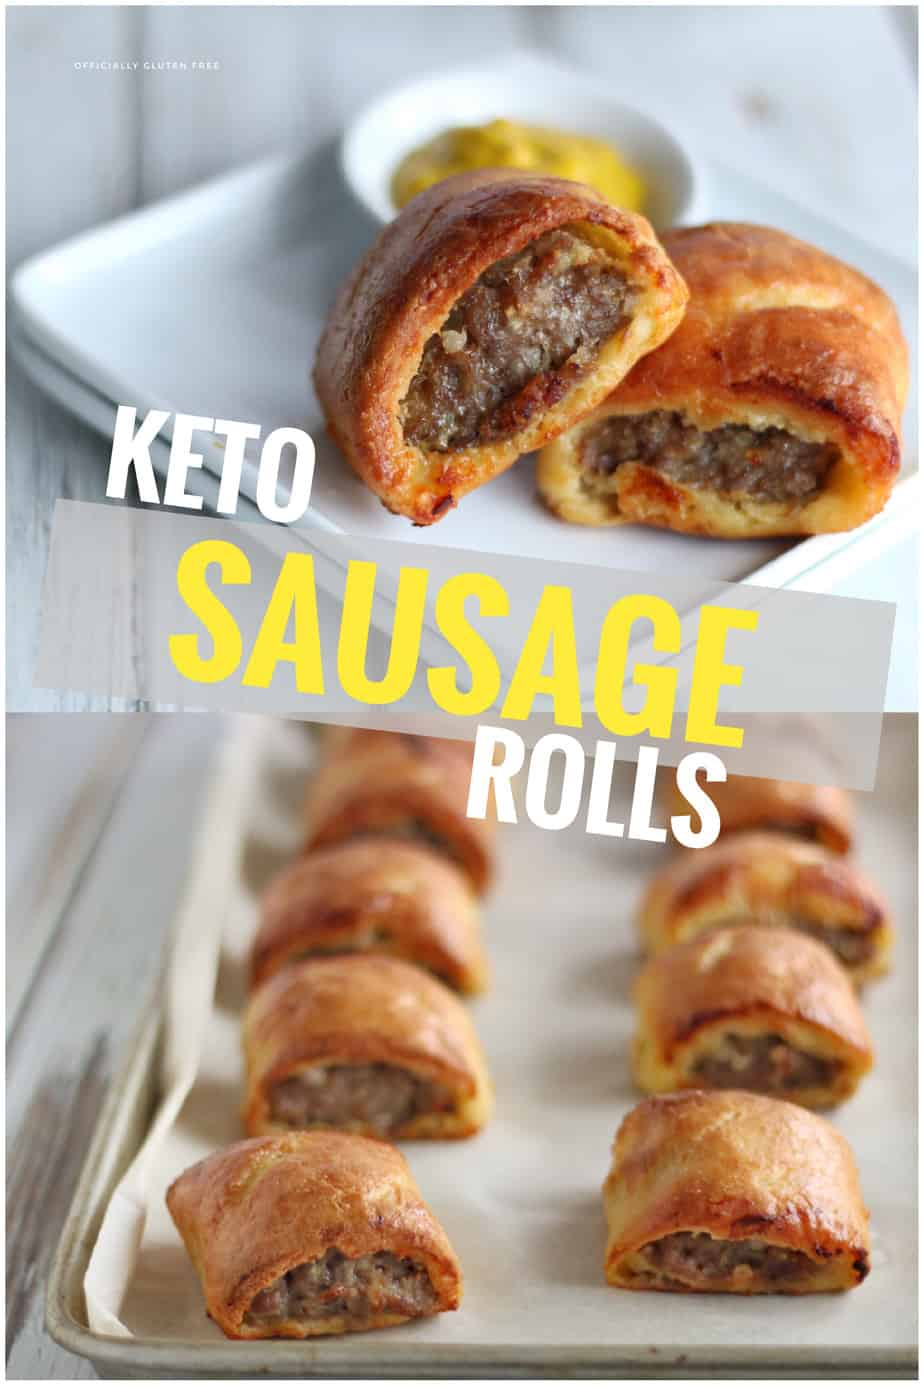 Keto Sausage Rolls